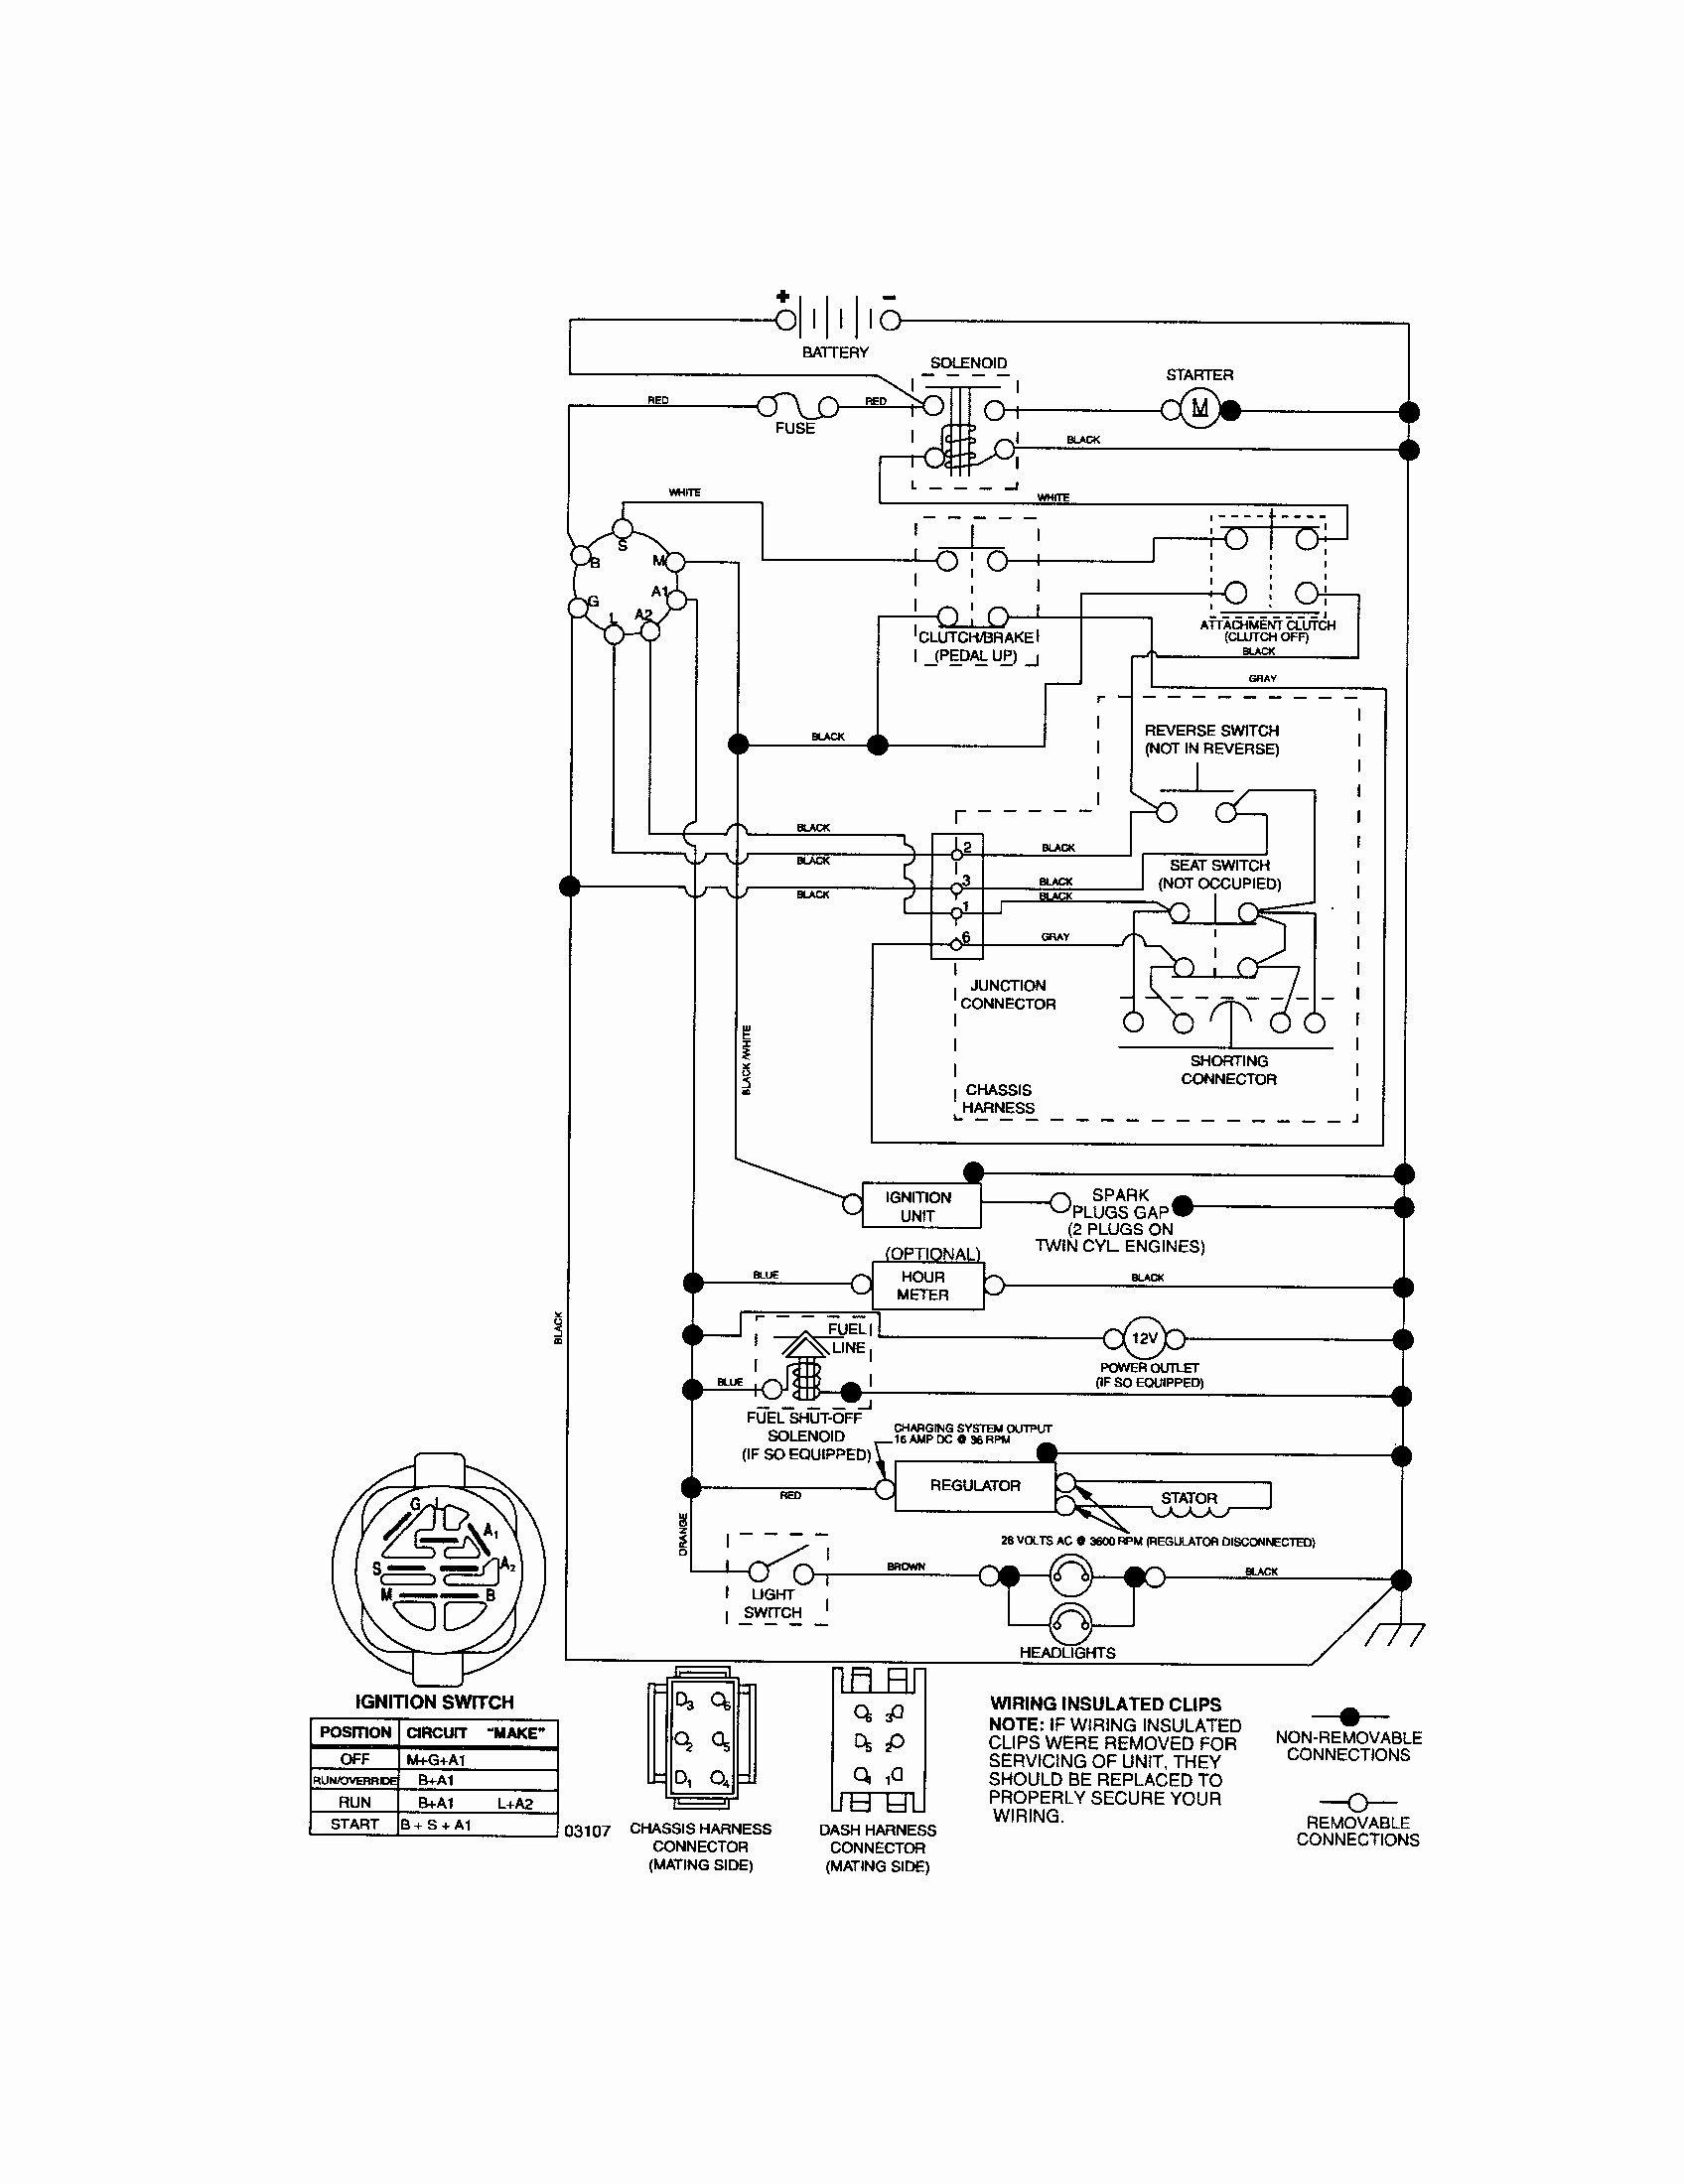 Kohler Engine Ignition Wiring Diagram